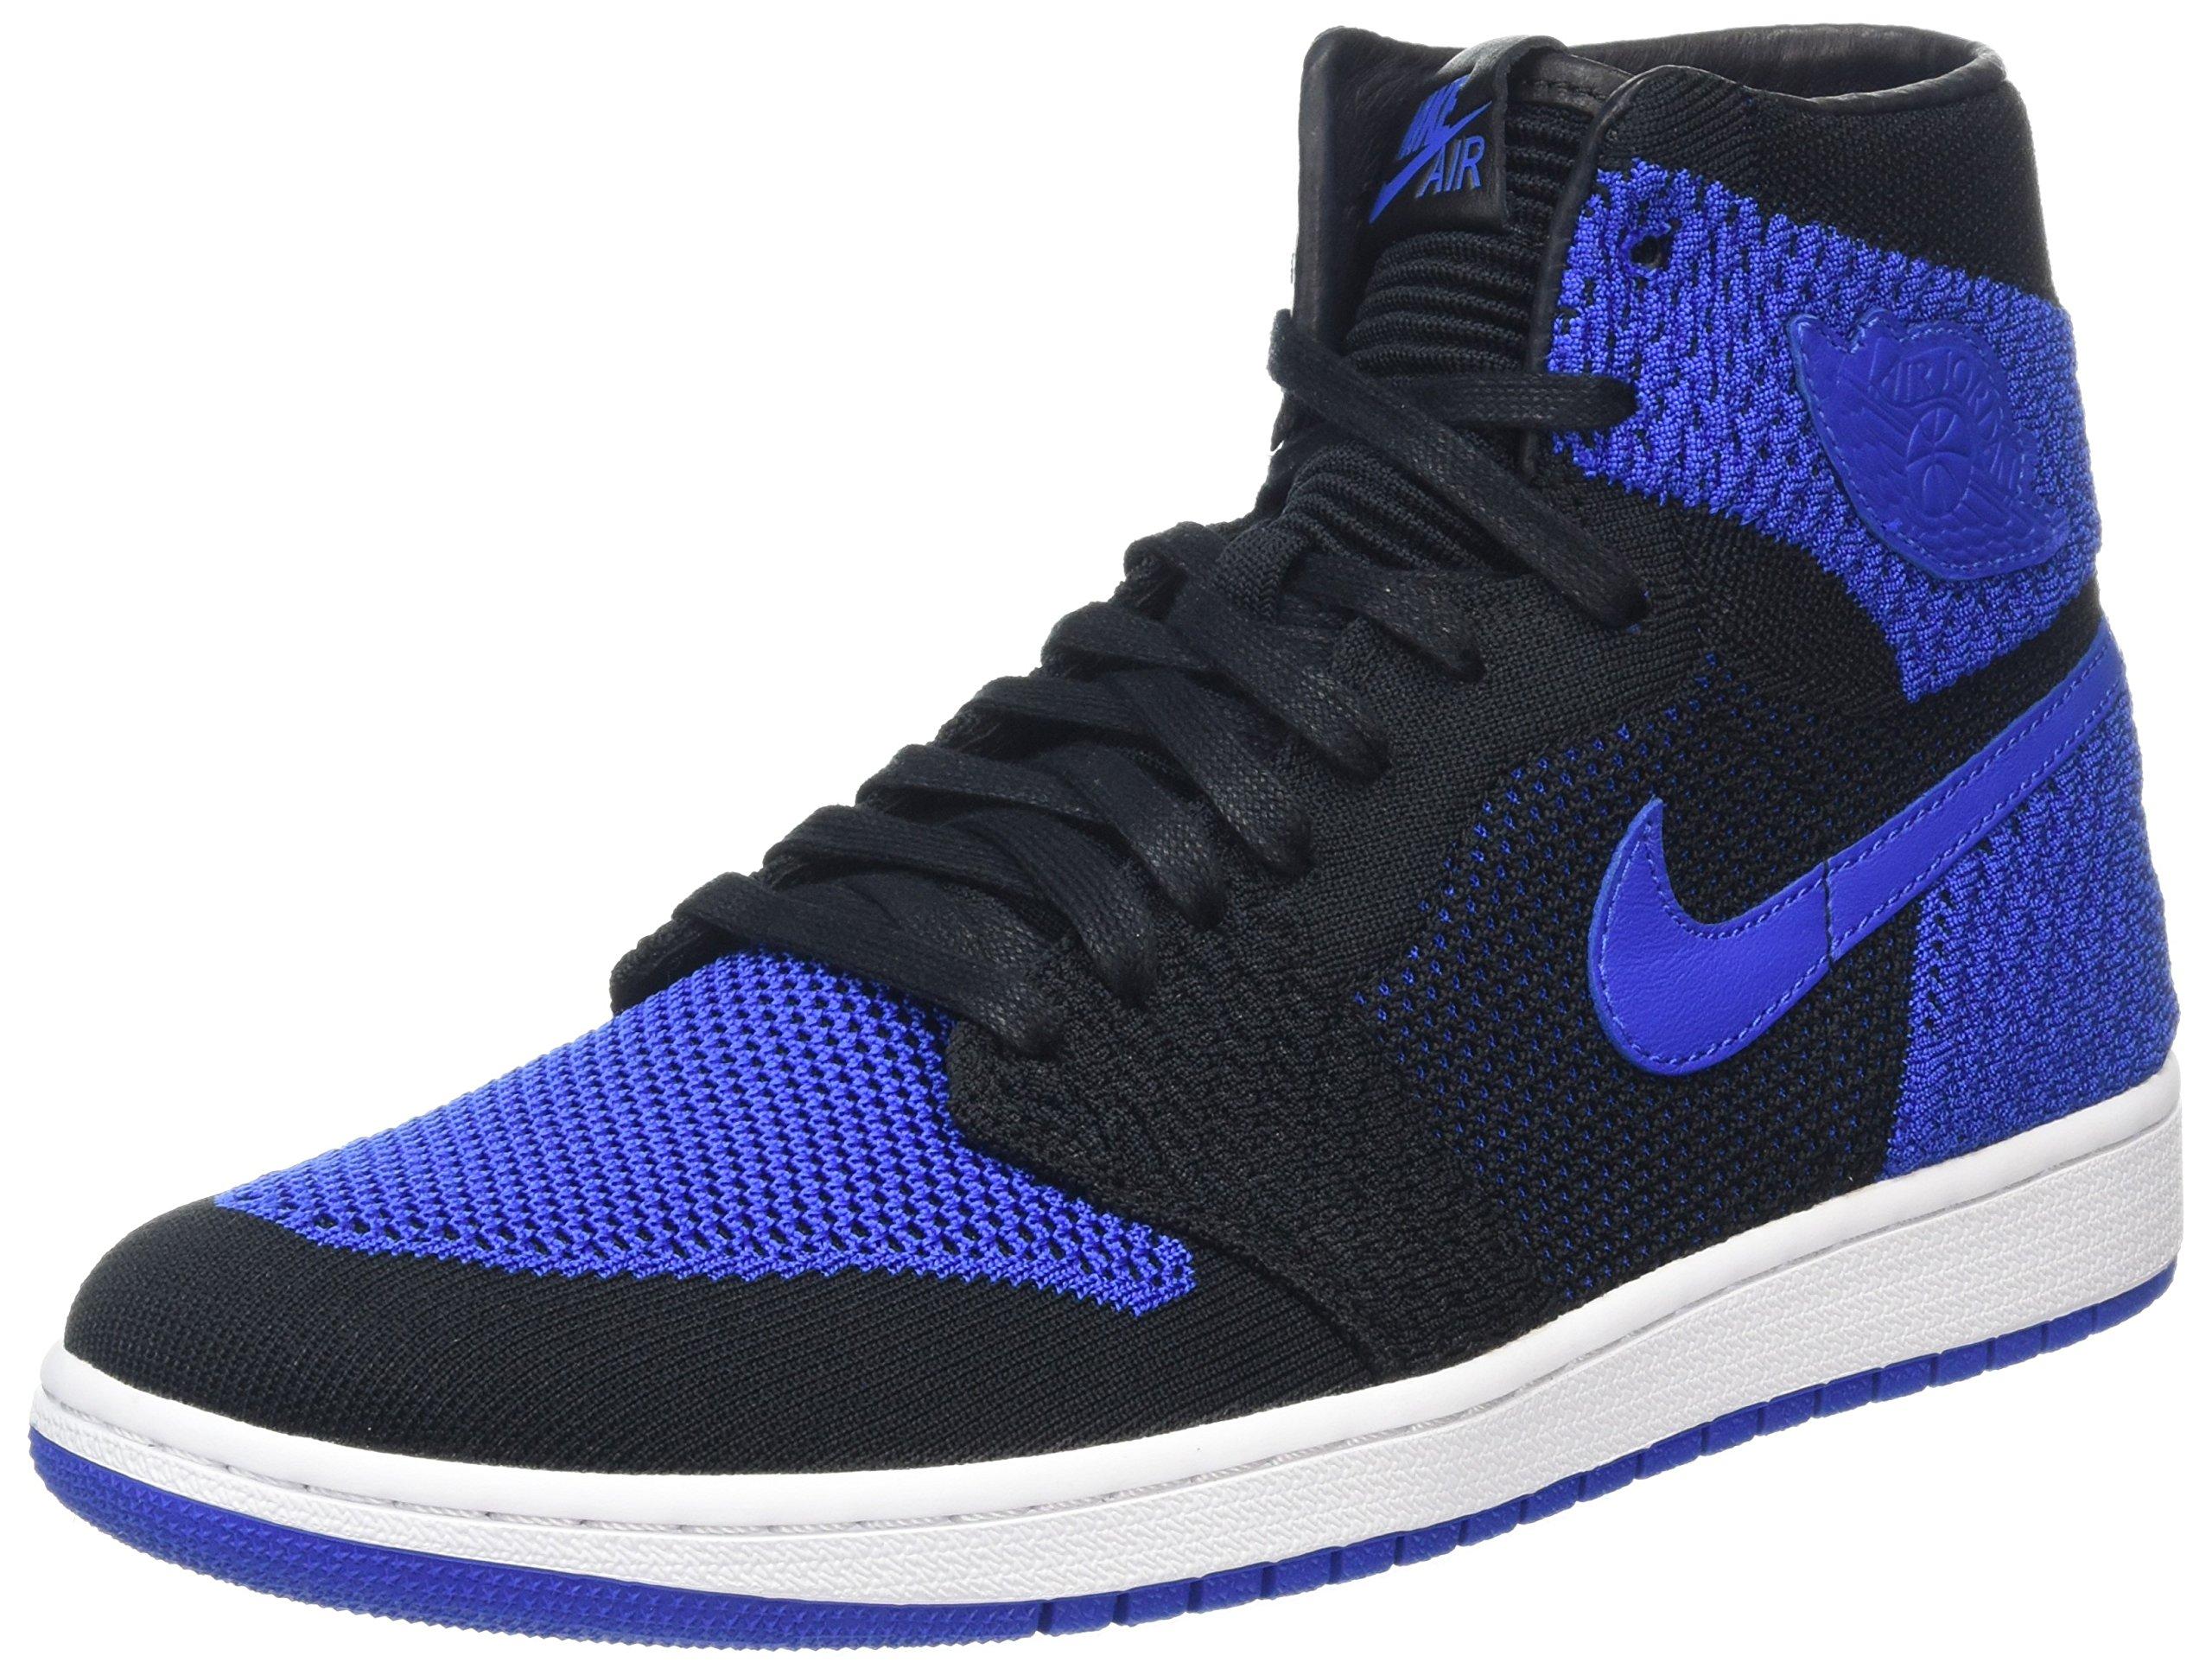 60e9a0282df Galleon - Jordan Nike Mens Air 1 High Flyknit Basketball Shoes Black Game  Royal White 919704-006 Size 12